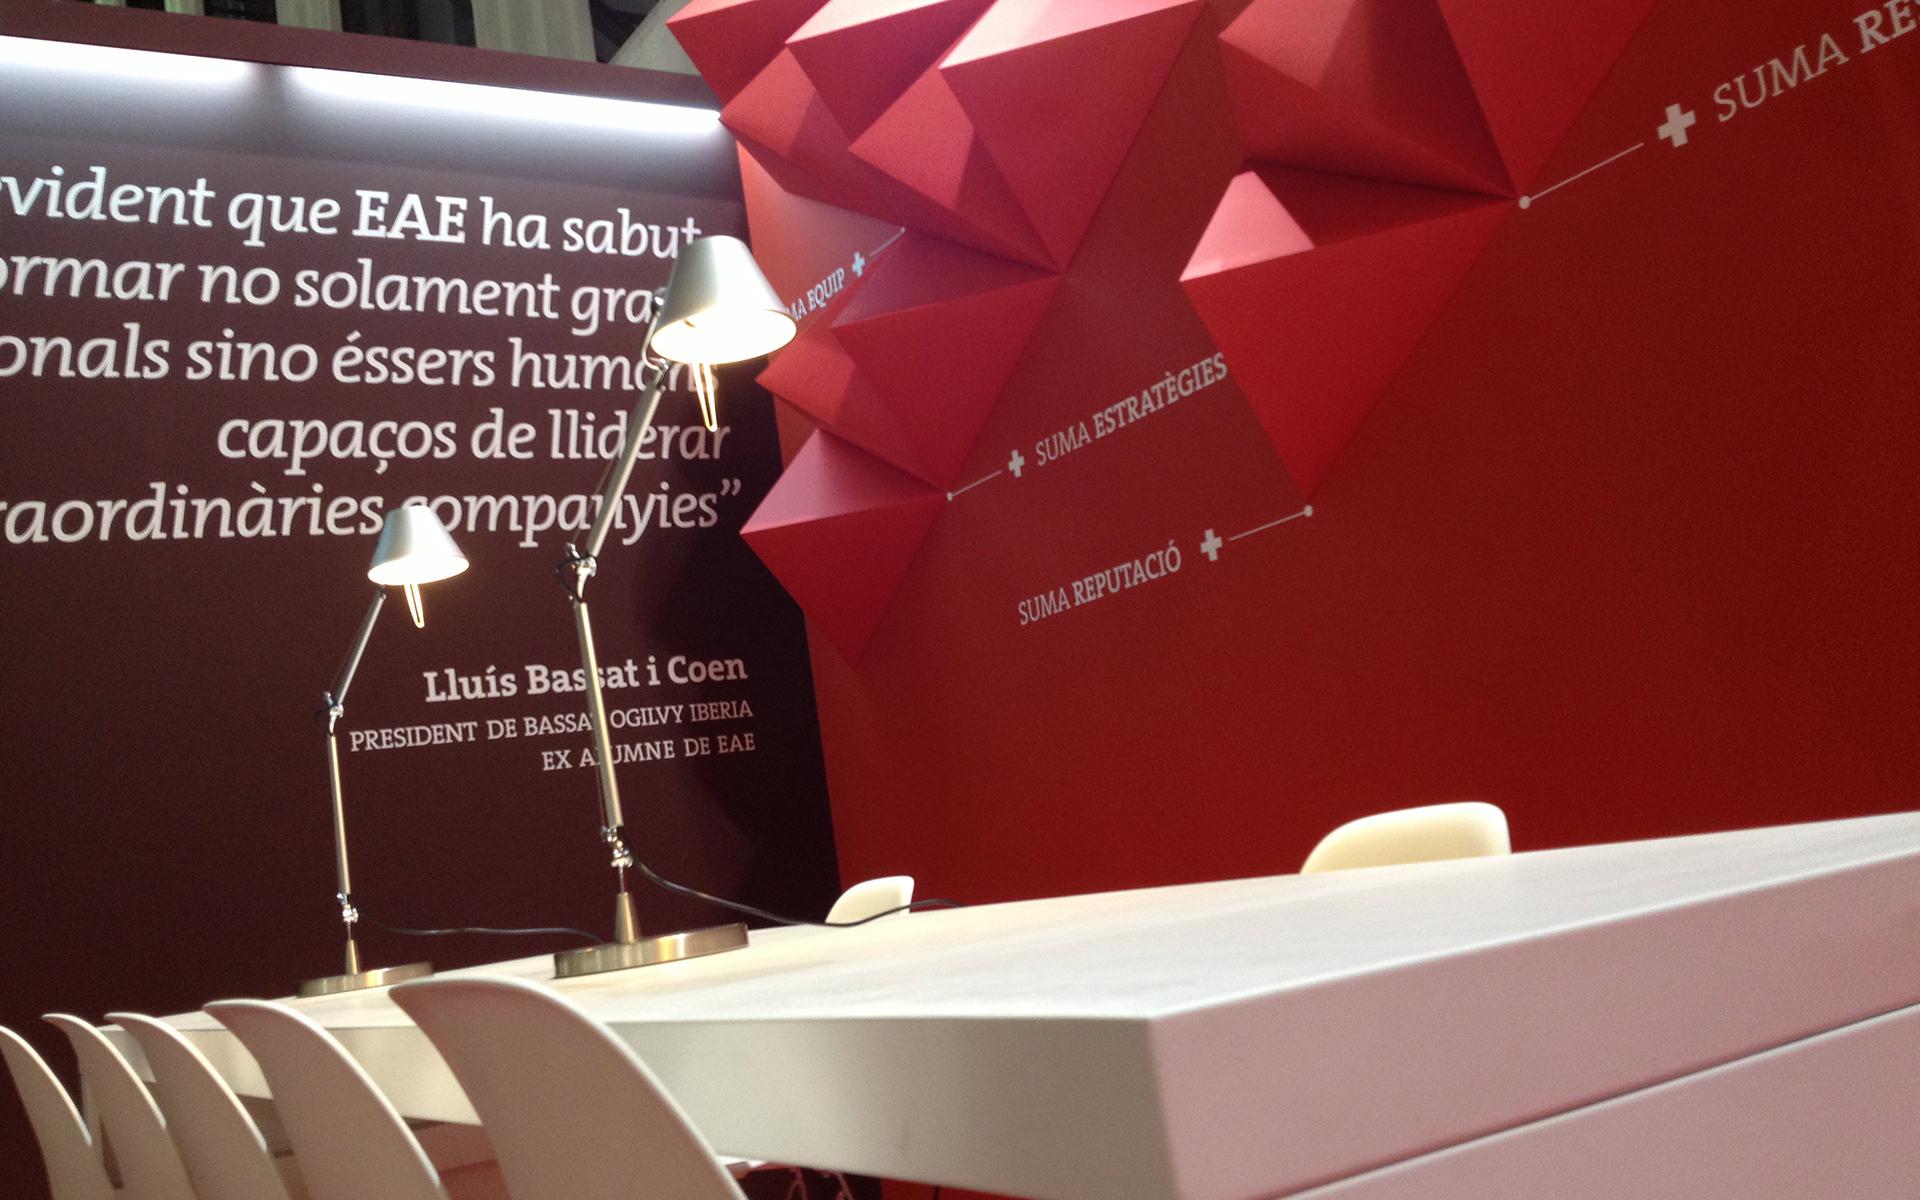 EAE > geometrics > SALO DE L'ENSENYAMENT'13